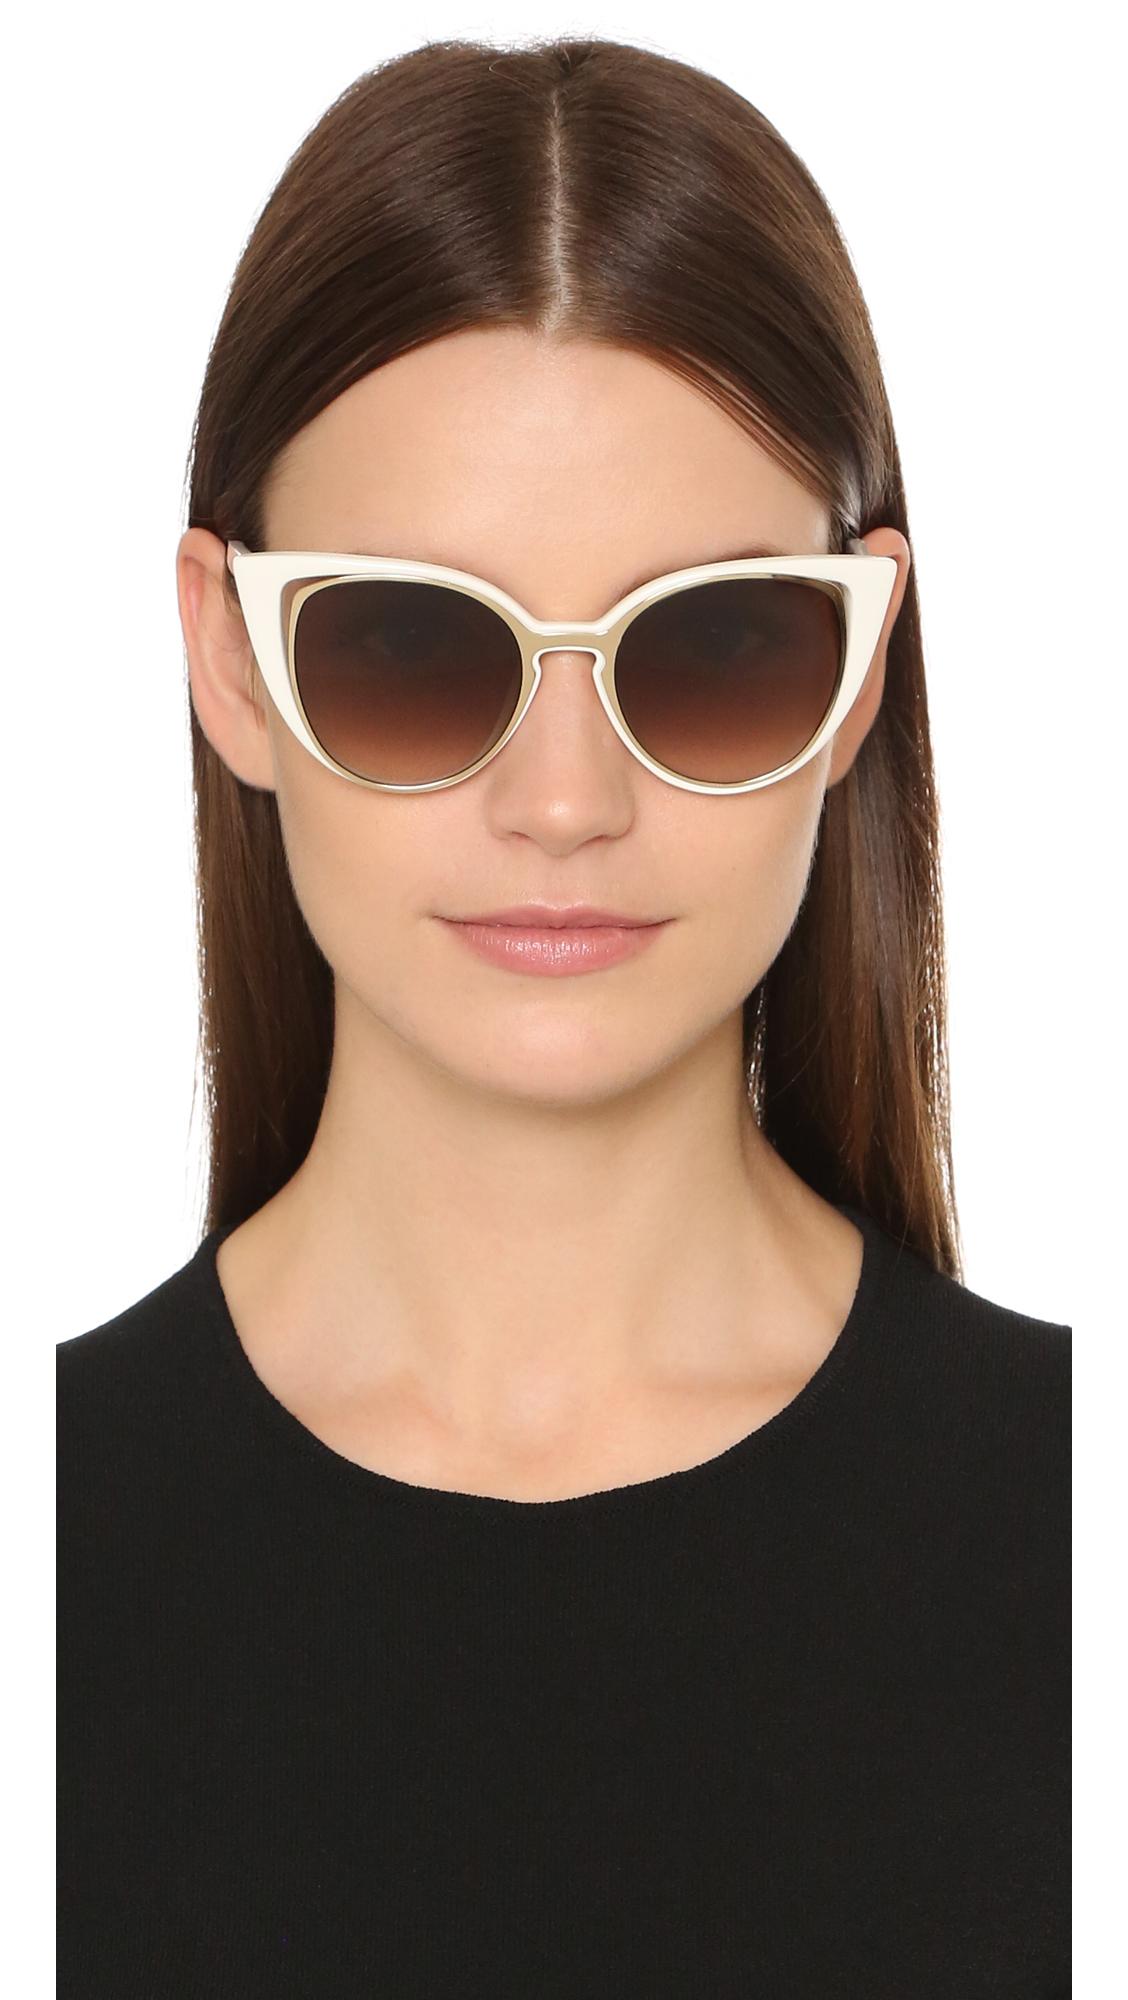 5ea1a21e3ed Lyst - Fendi Cutout Cat Eye Sunglasses - Gold White brown Shade in ...